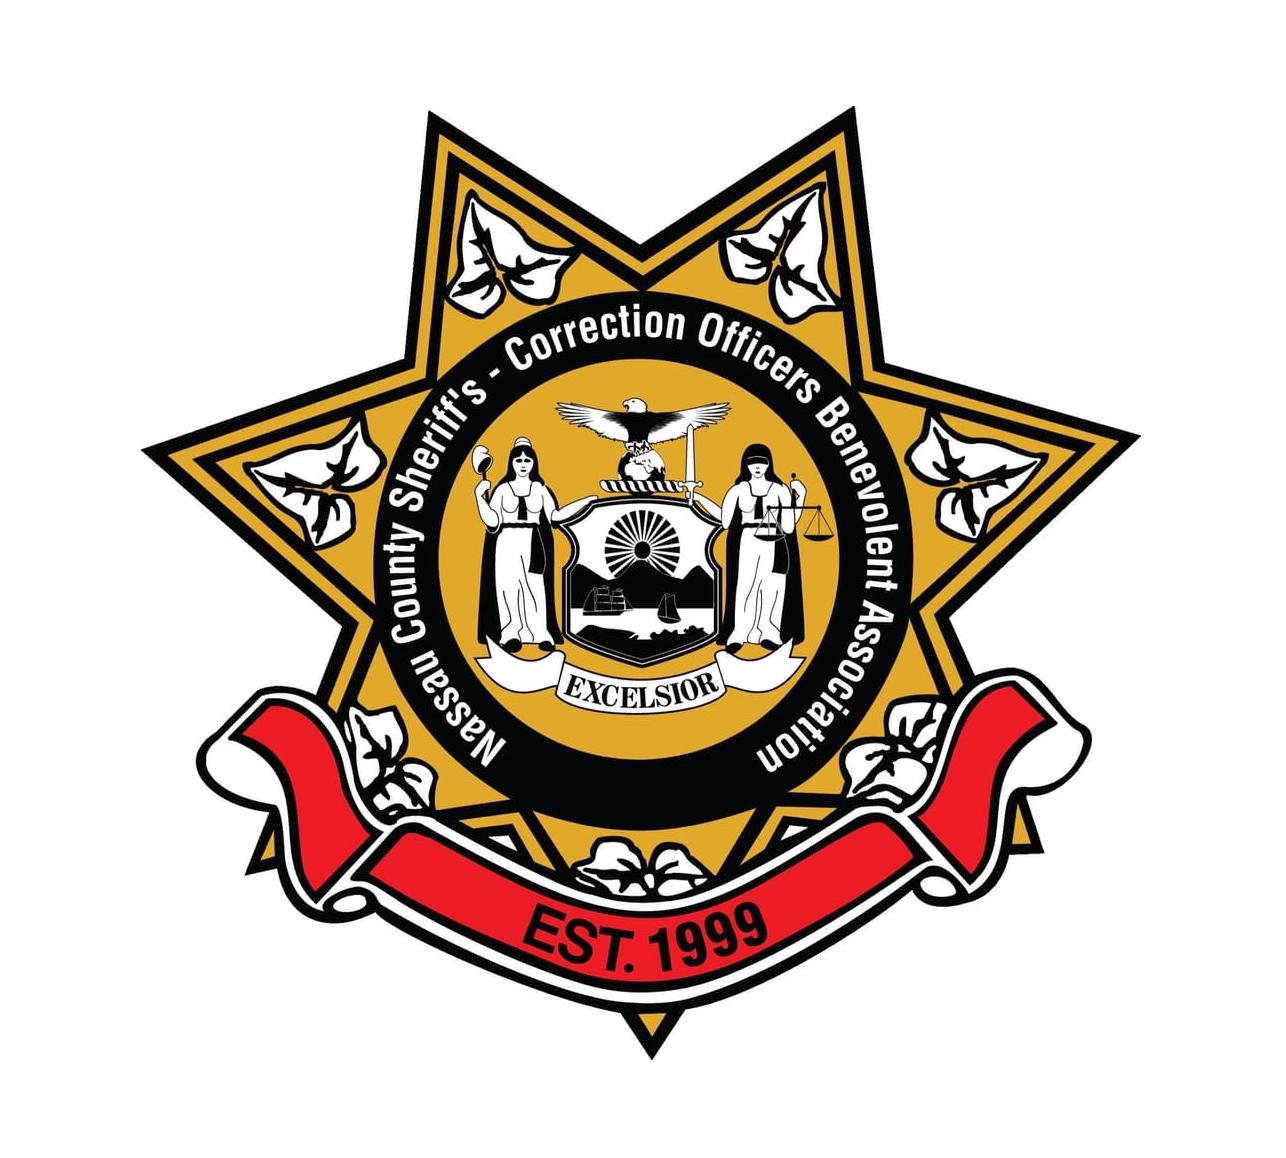 nassau_county_sheriffs_correction_officer_beneveloent_assoc.png